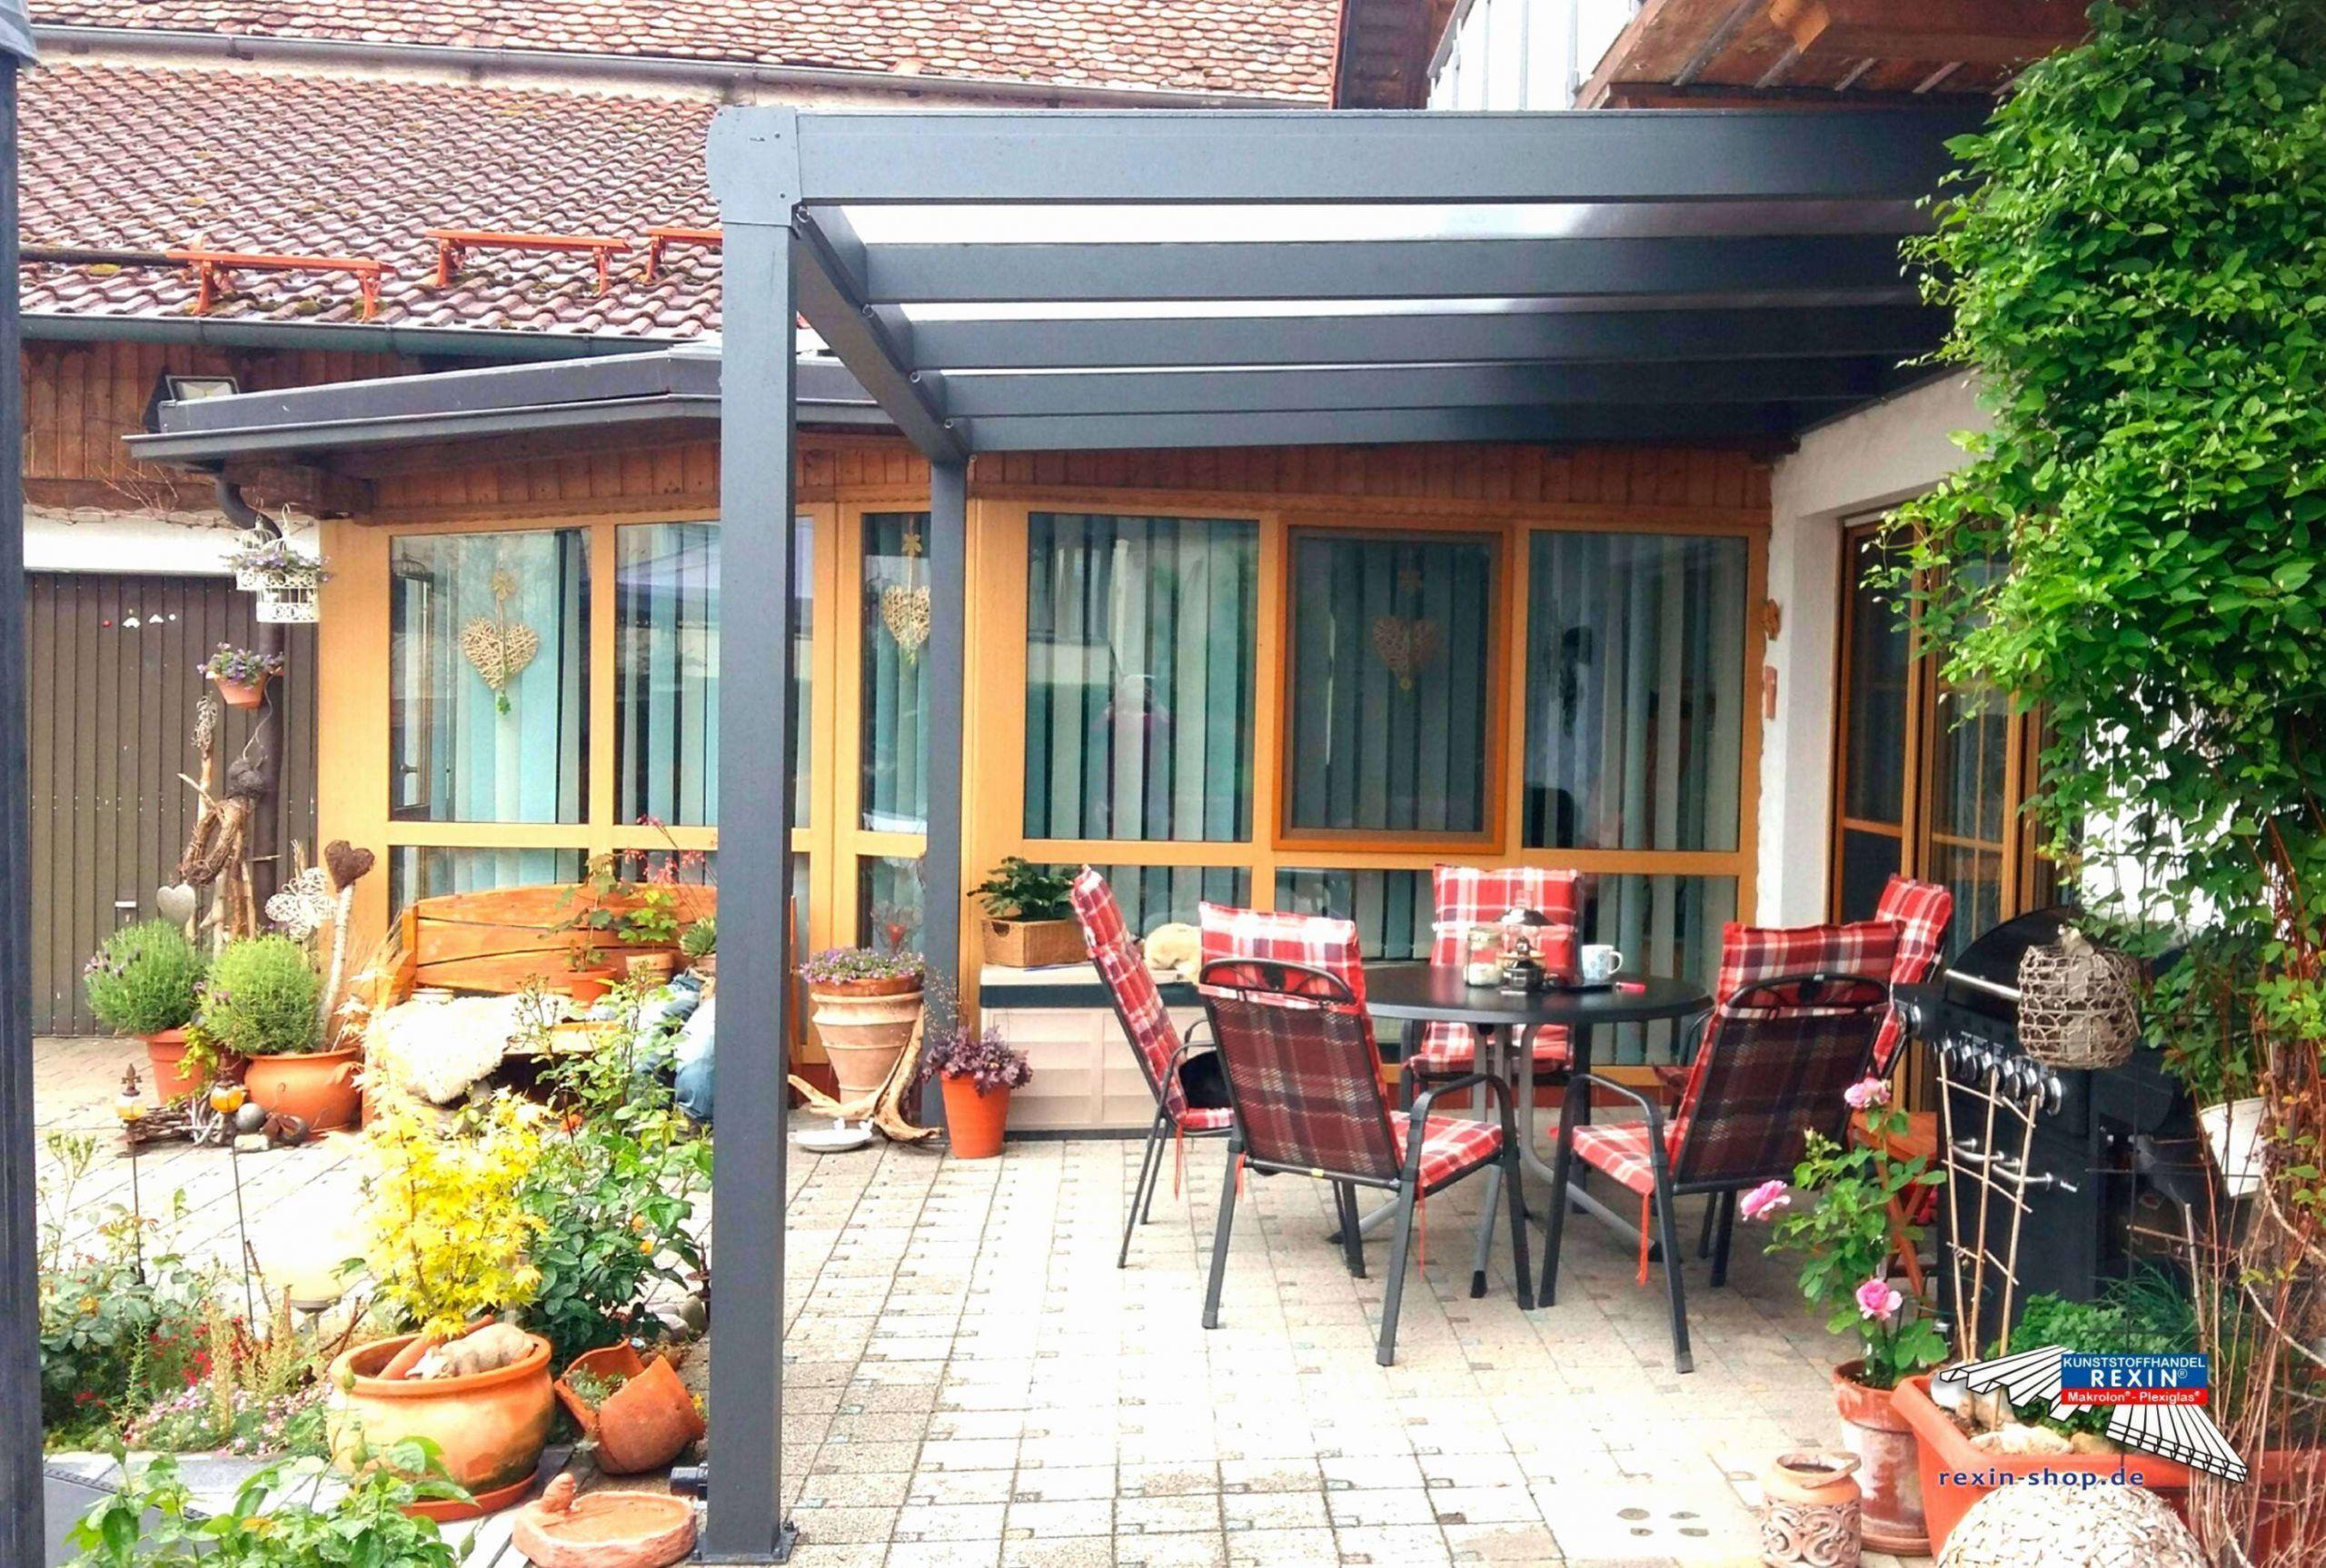 Balkon Dekoration Einzigartig Deko Garten Selber Machen — Temobardz Home Blog